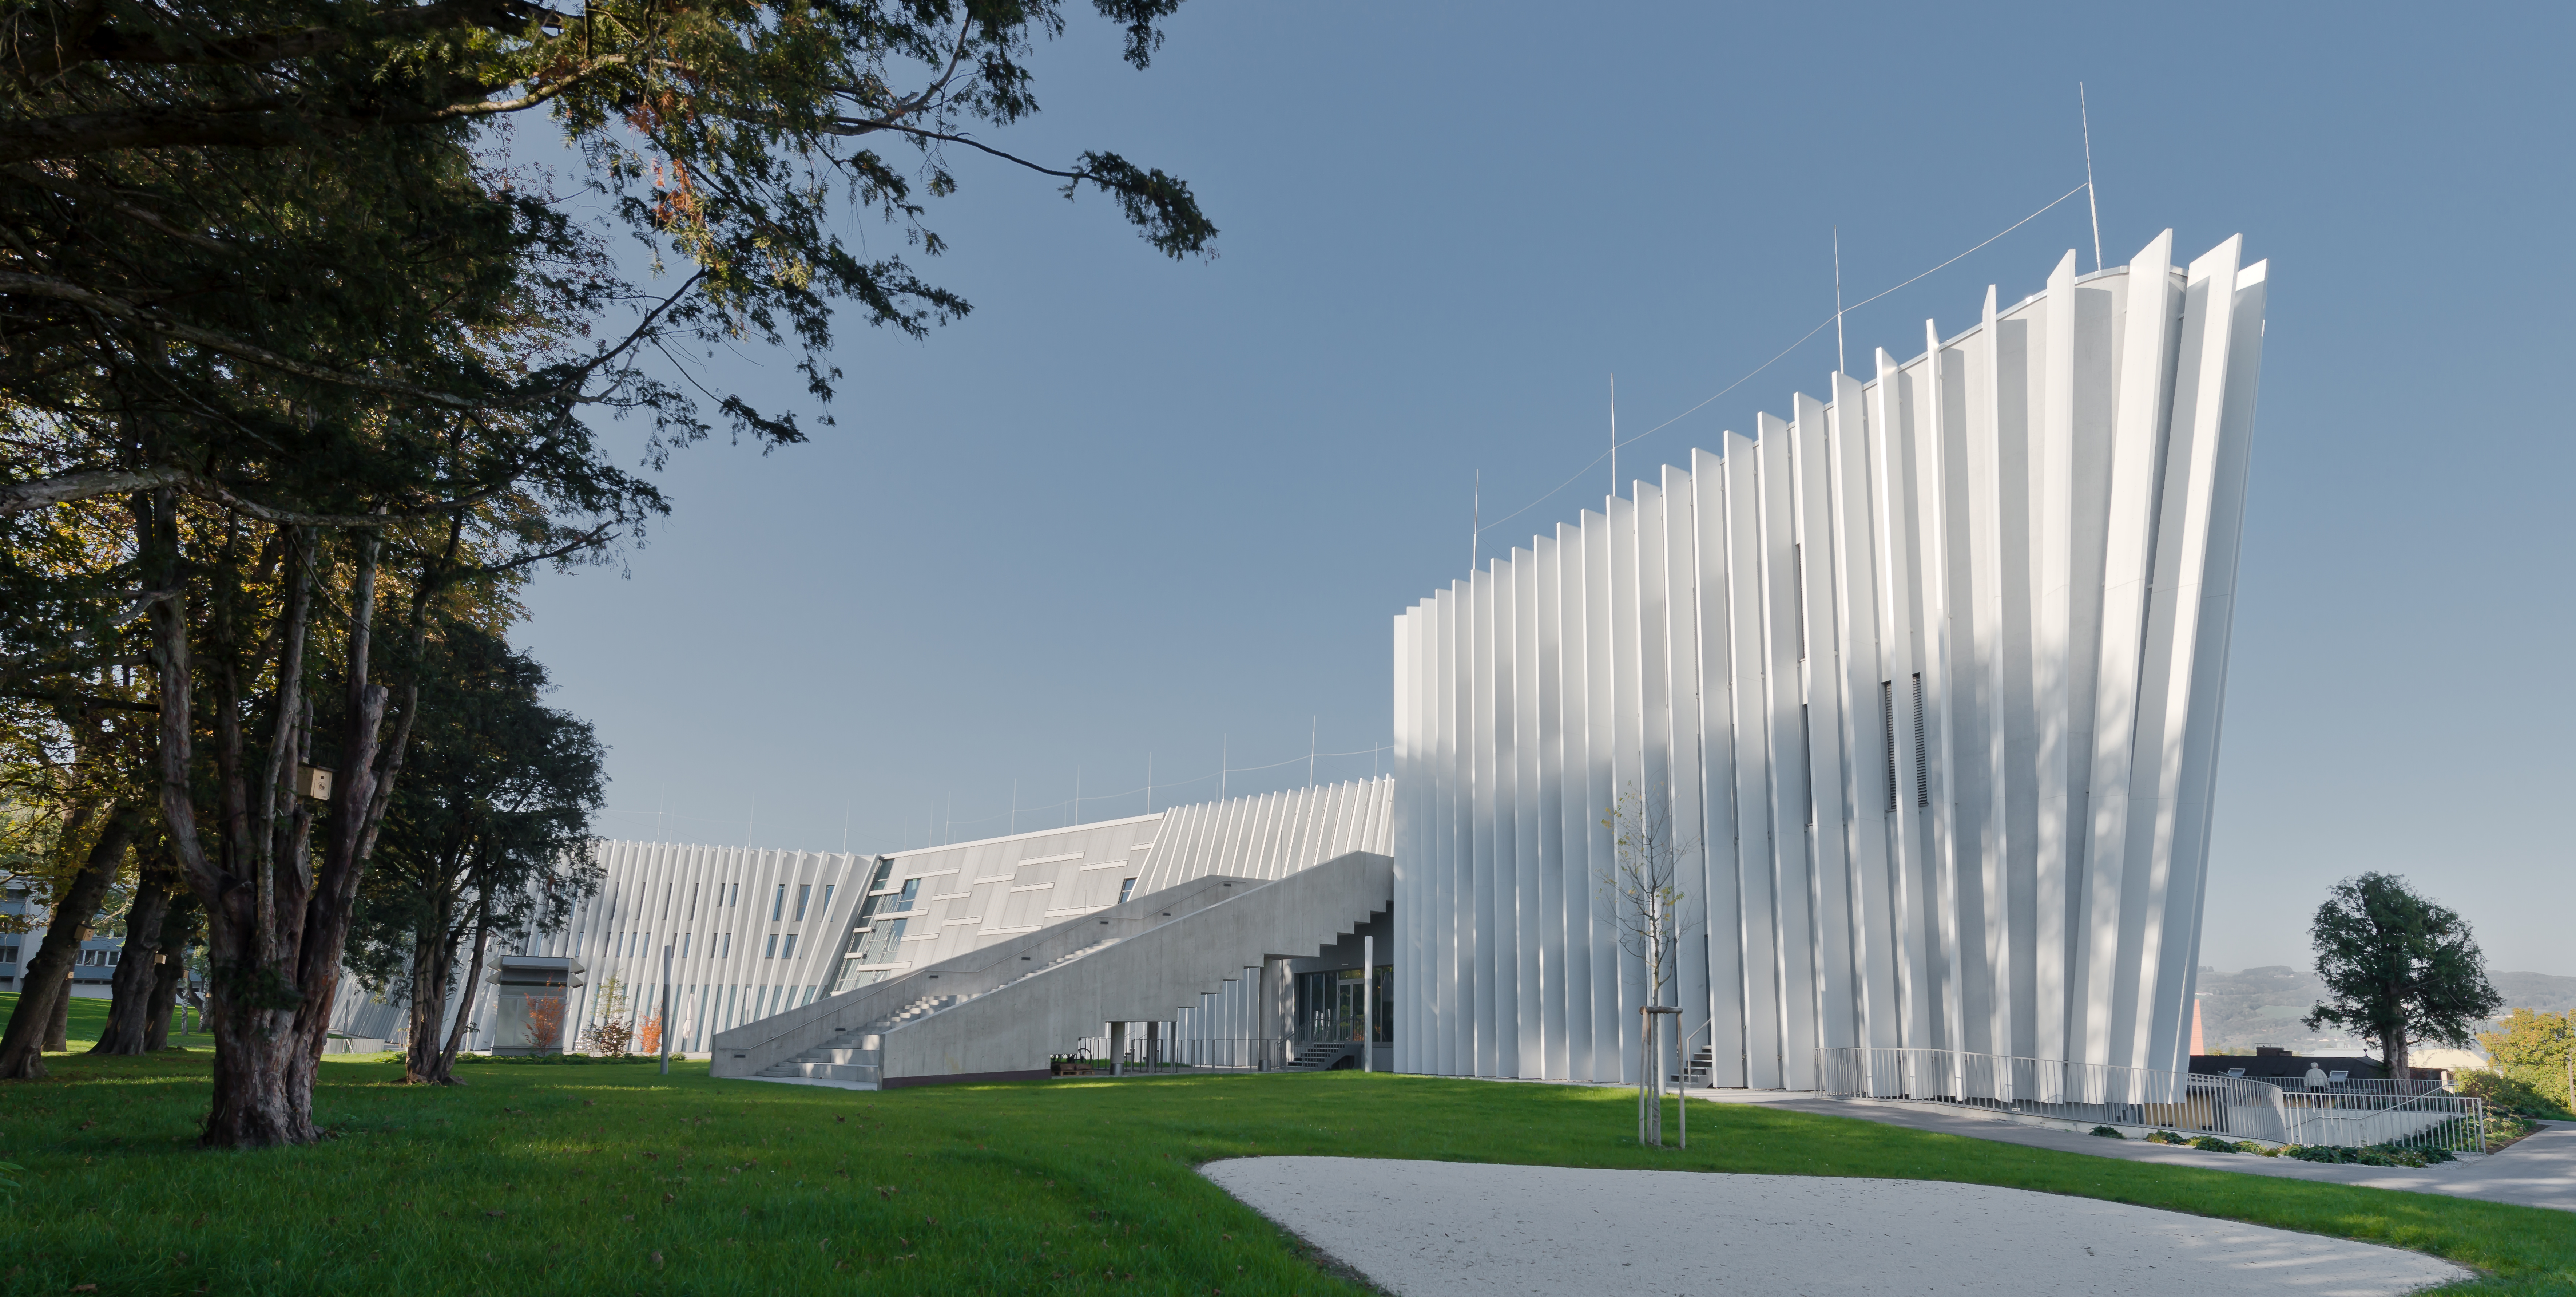 A.-Bruckner-Universität Linz